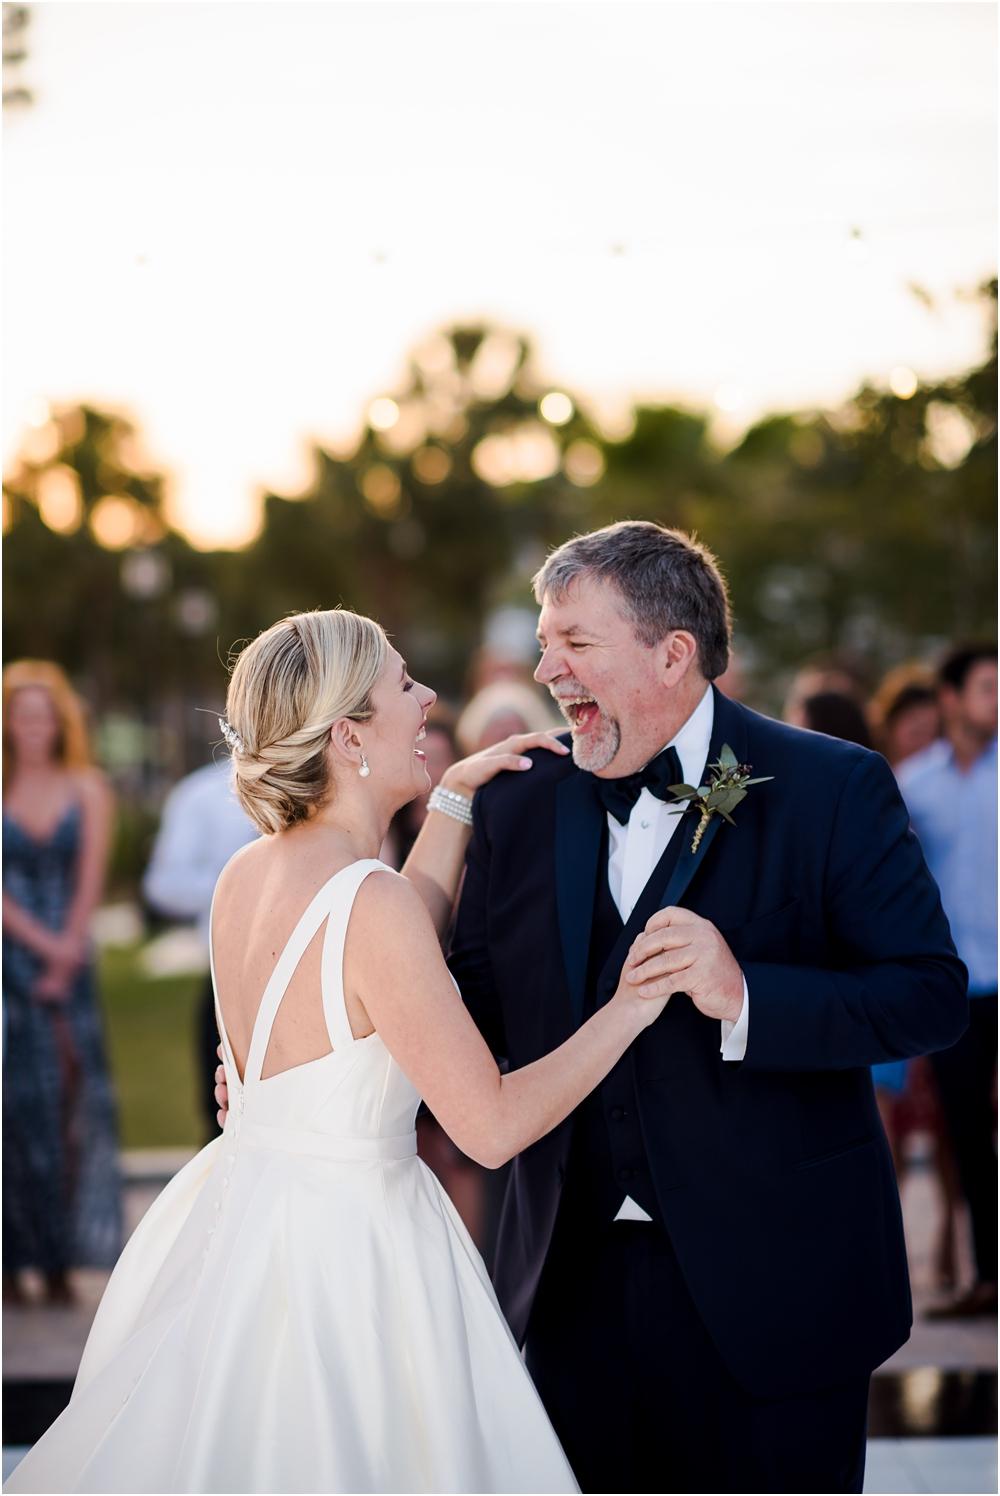 wilkins-sheraton-panama-city-beach-florida-wedding-dothan-tallahassee-kiersten-stevenson-photography-151.jpg